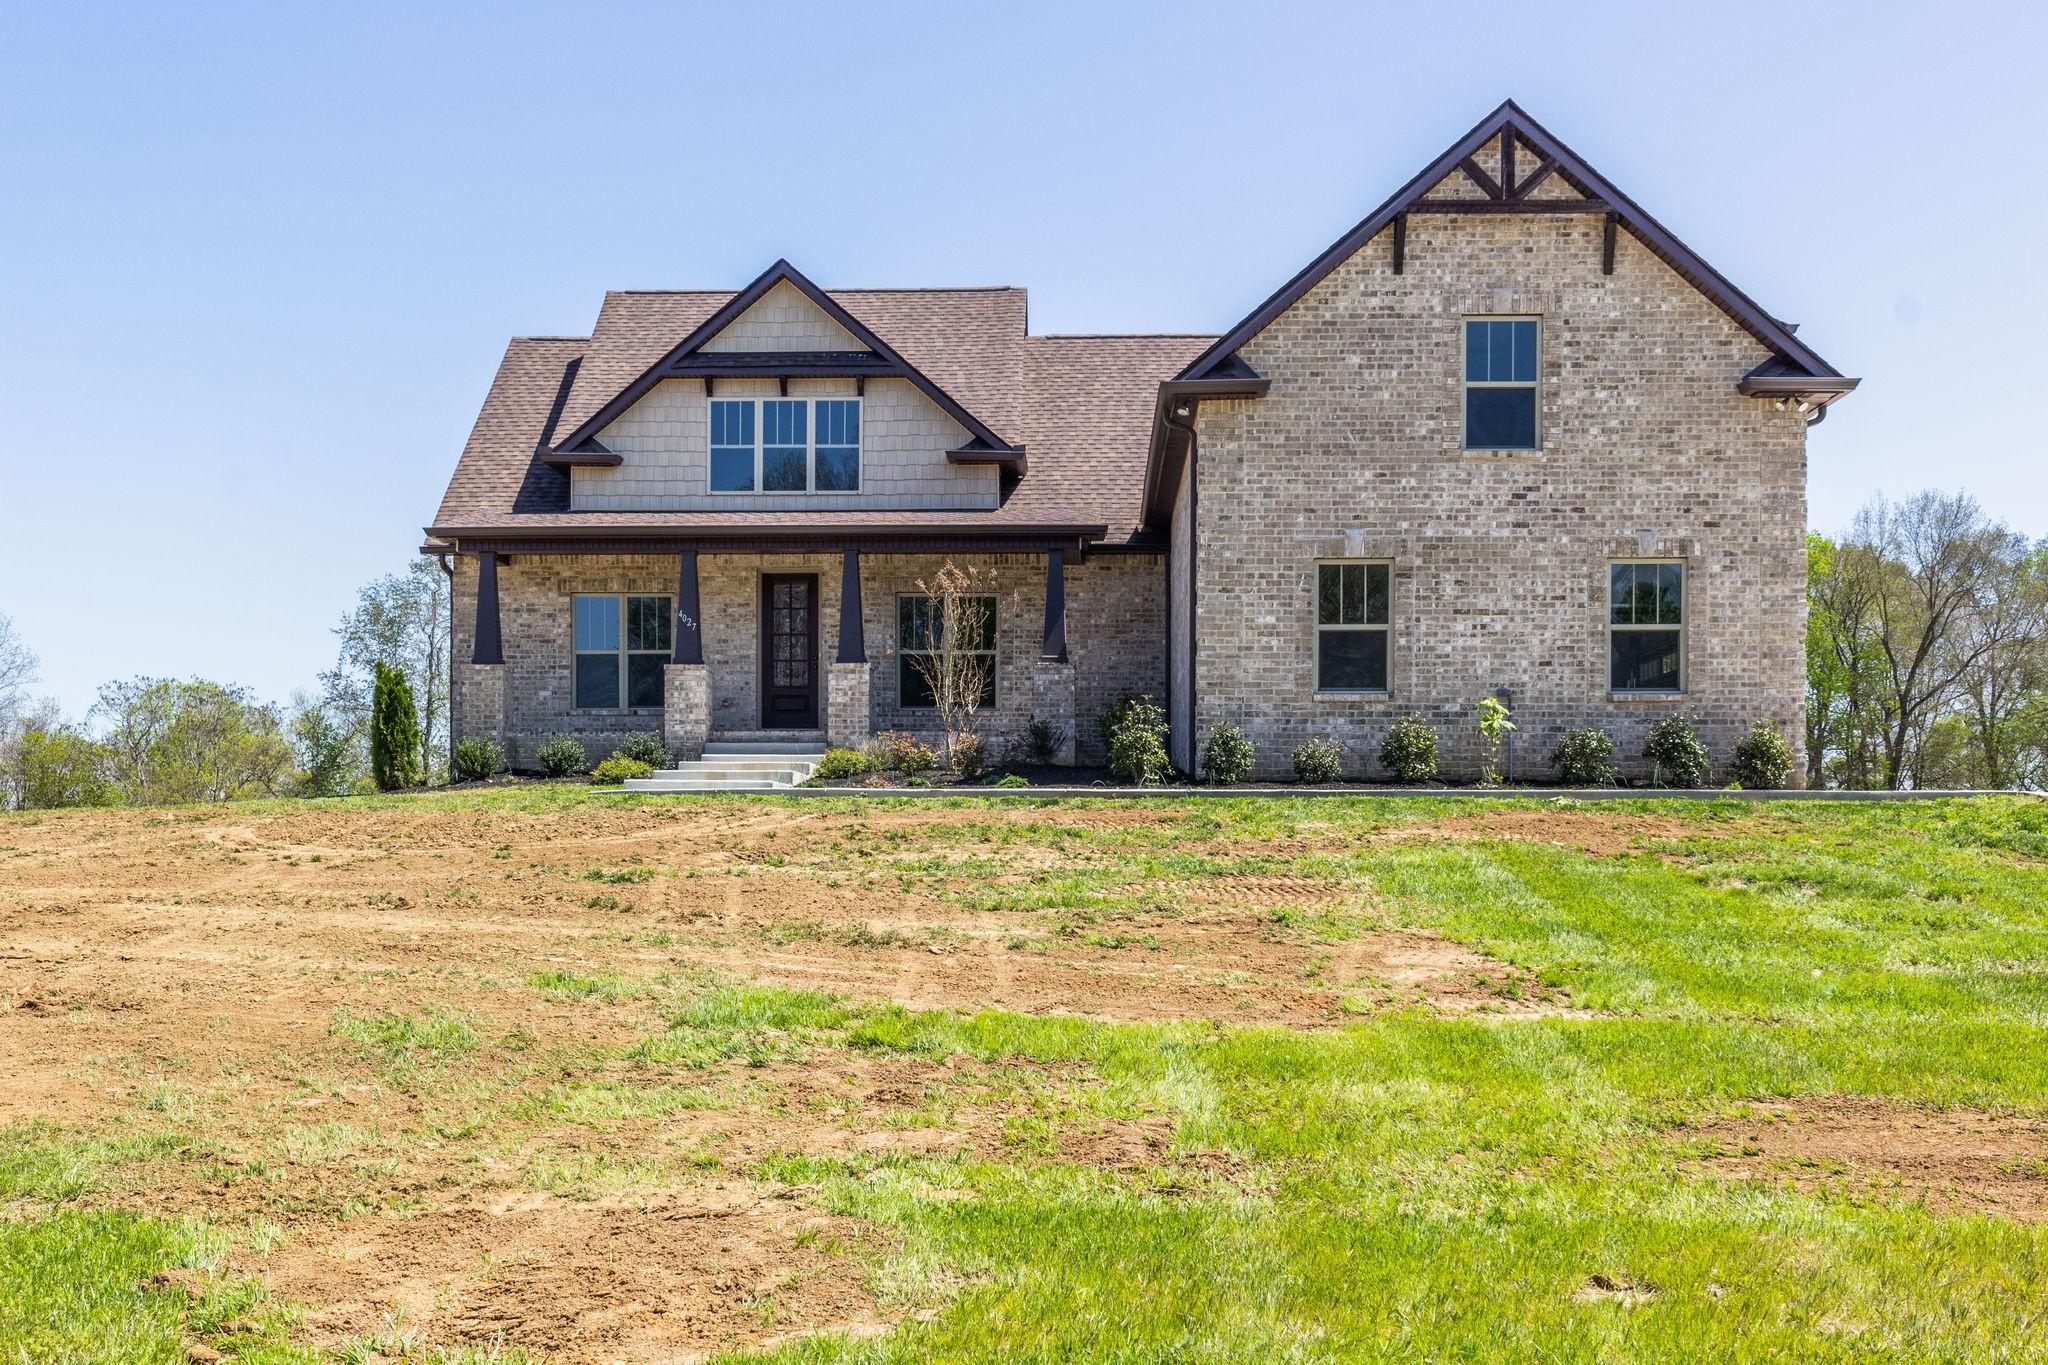 4027 Ironwood Dr, Greenbrier, TN 37073 - Greenbrier, TN real estate listing